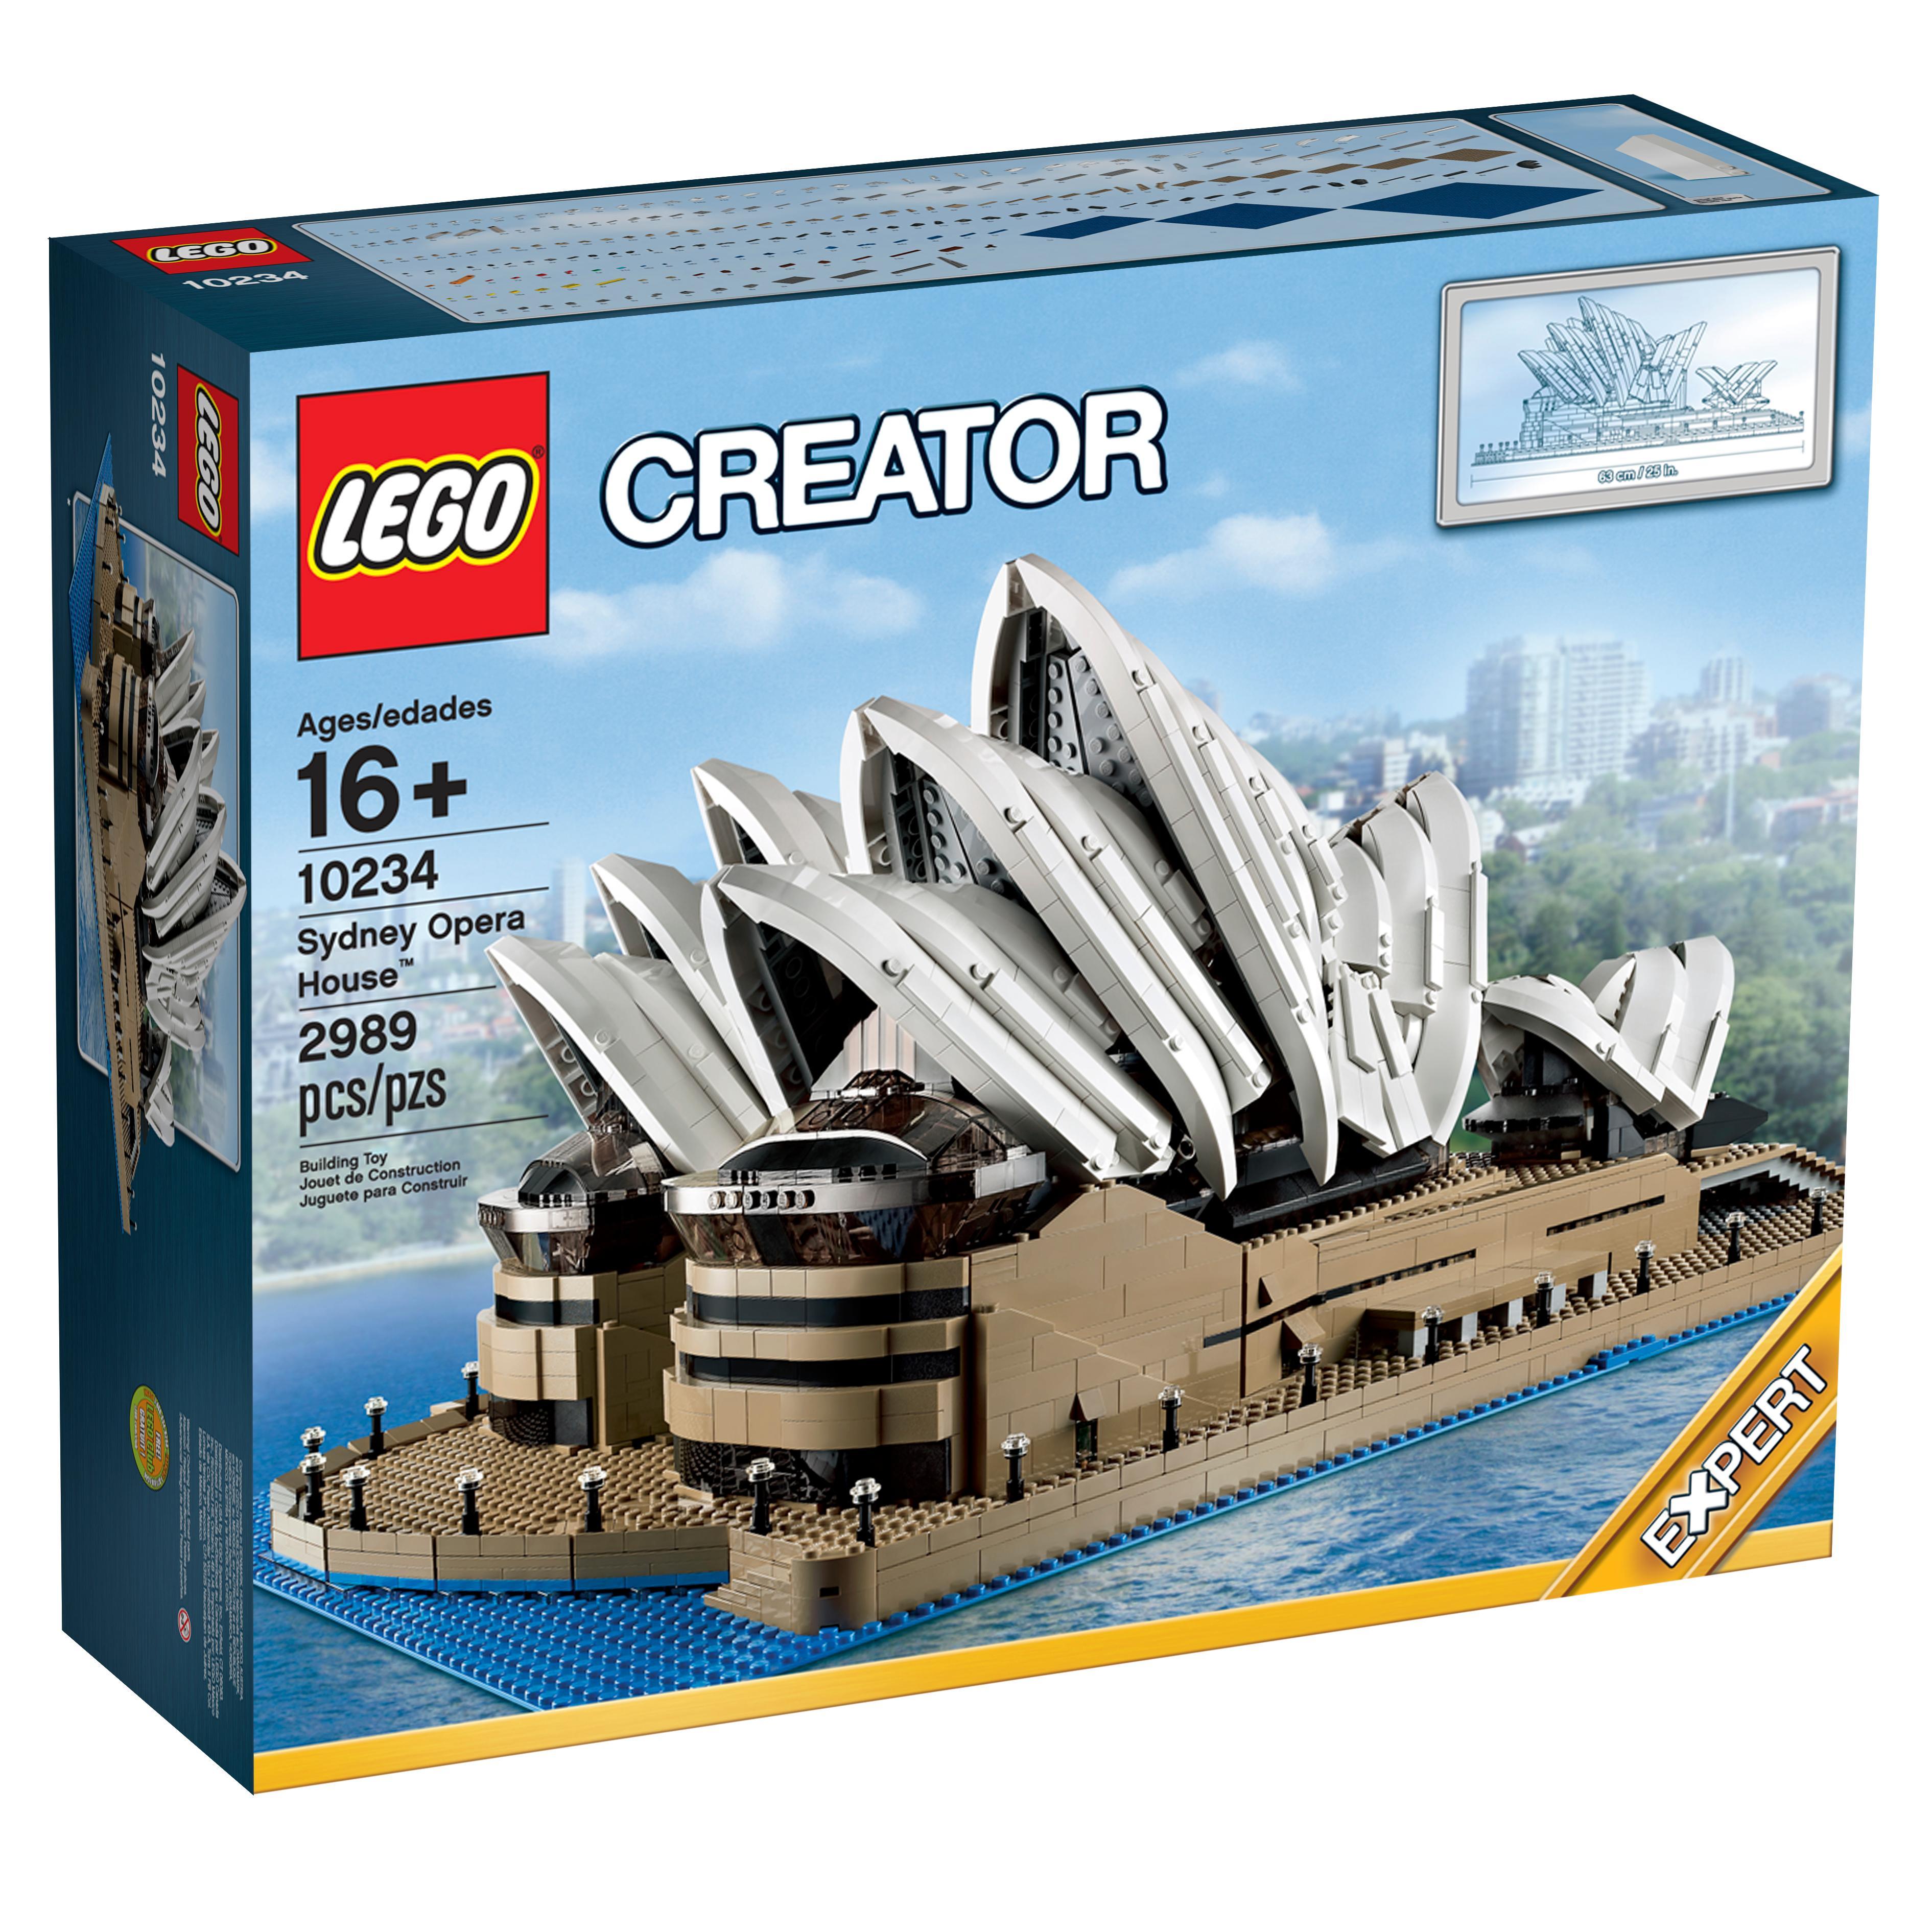 Building Sets Toy Airplane Trains Car Toys Bricks Megablocks Stacking Blocks